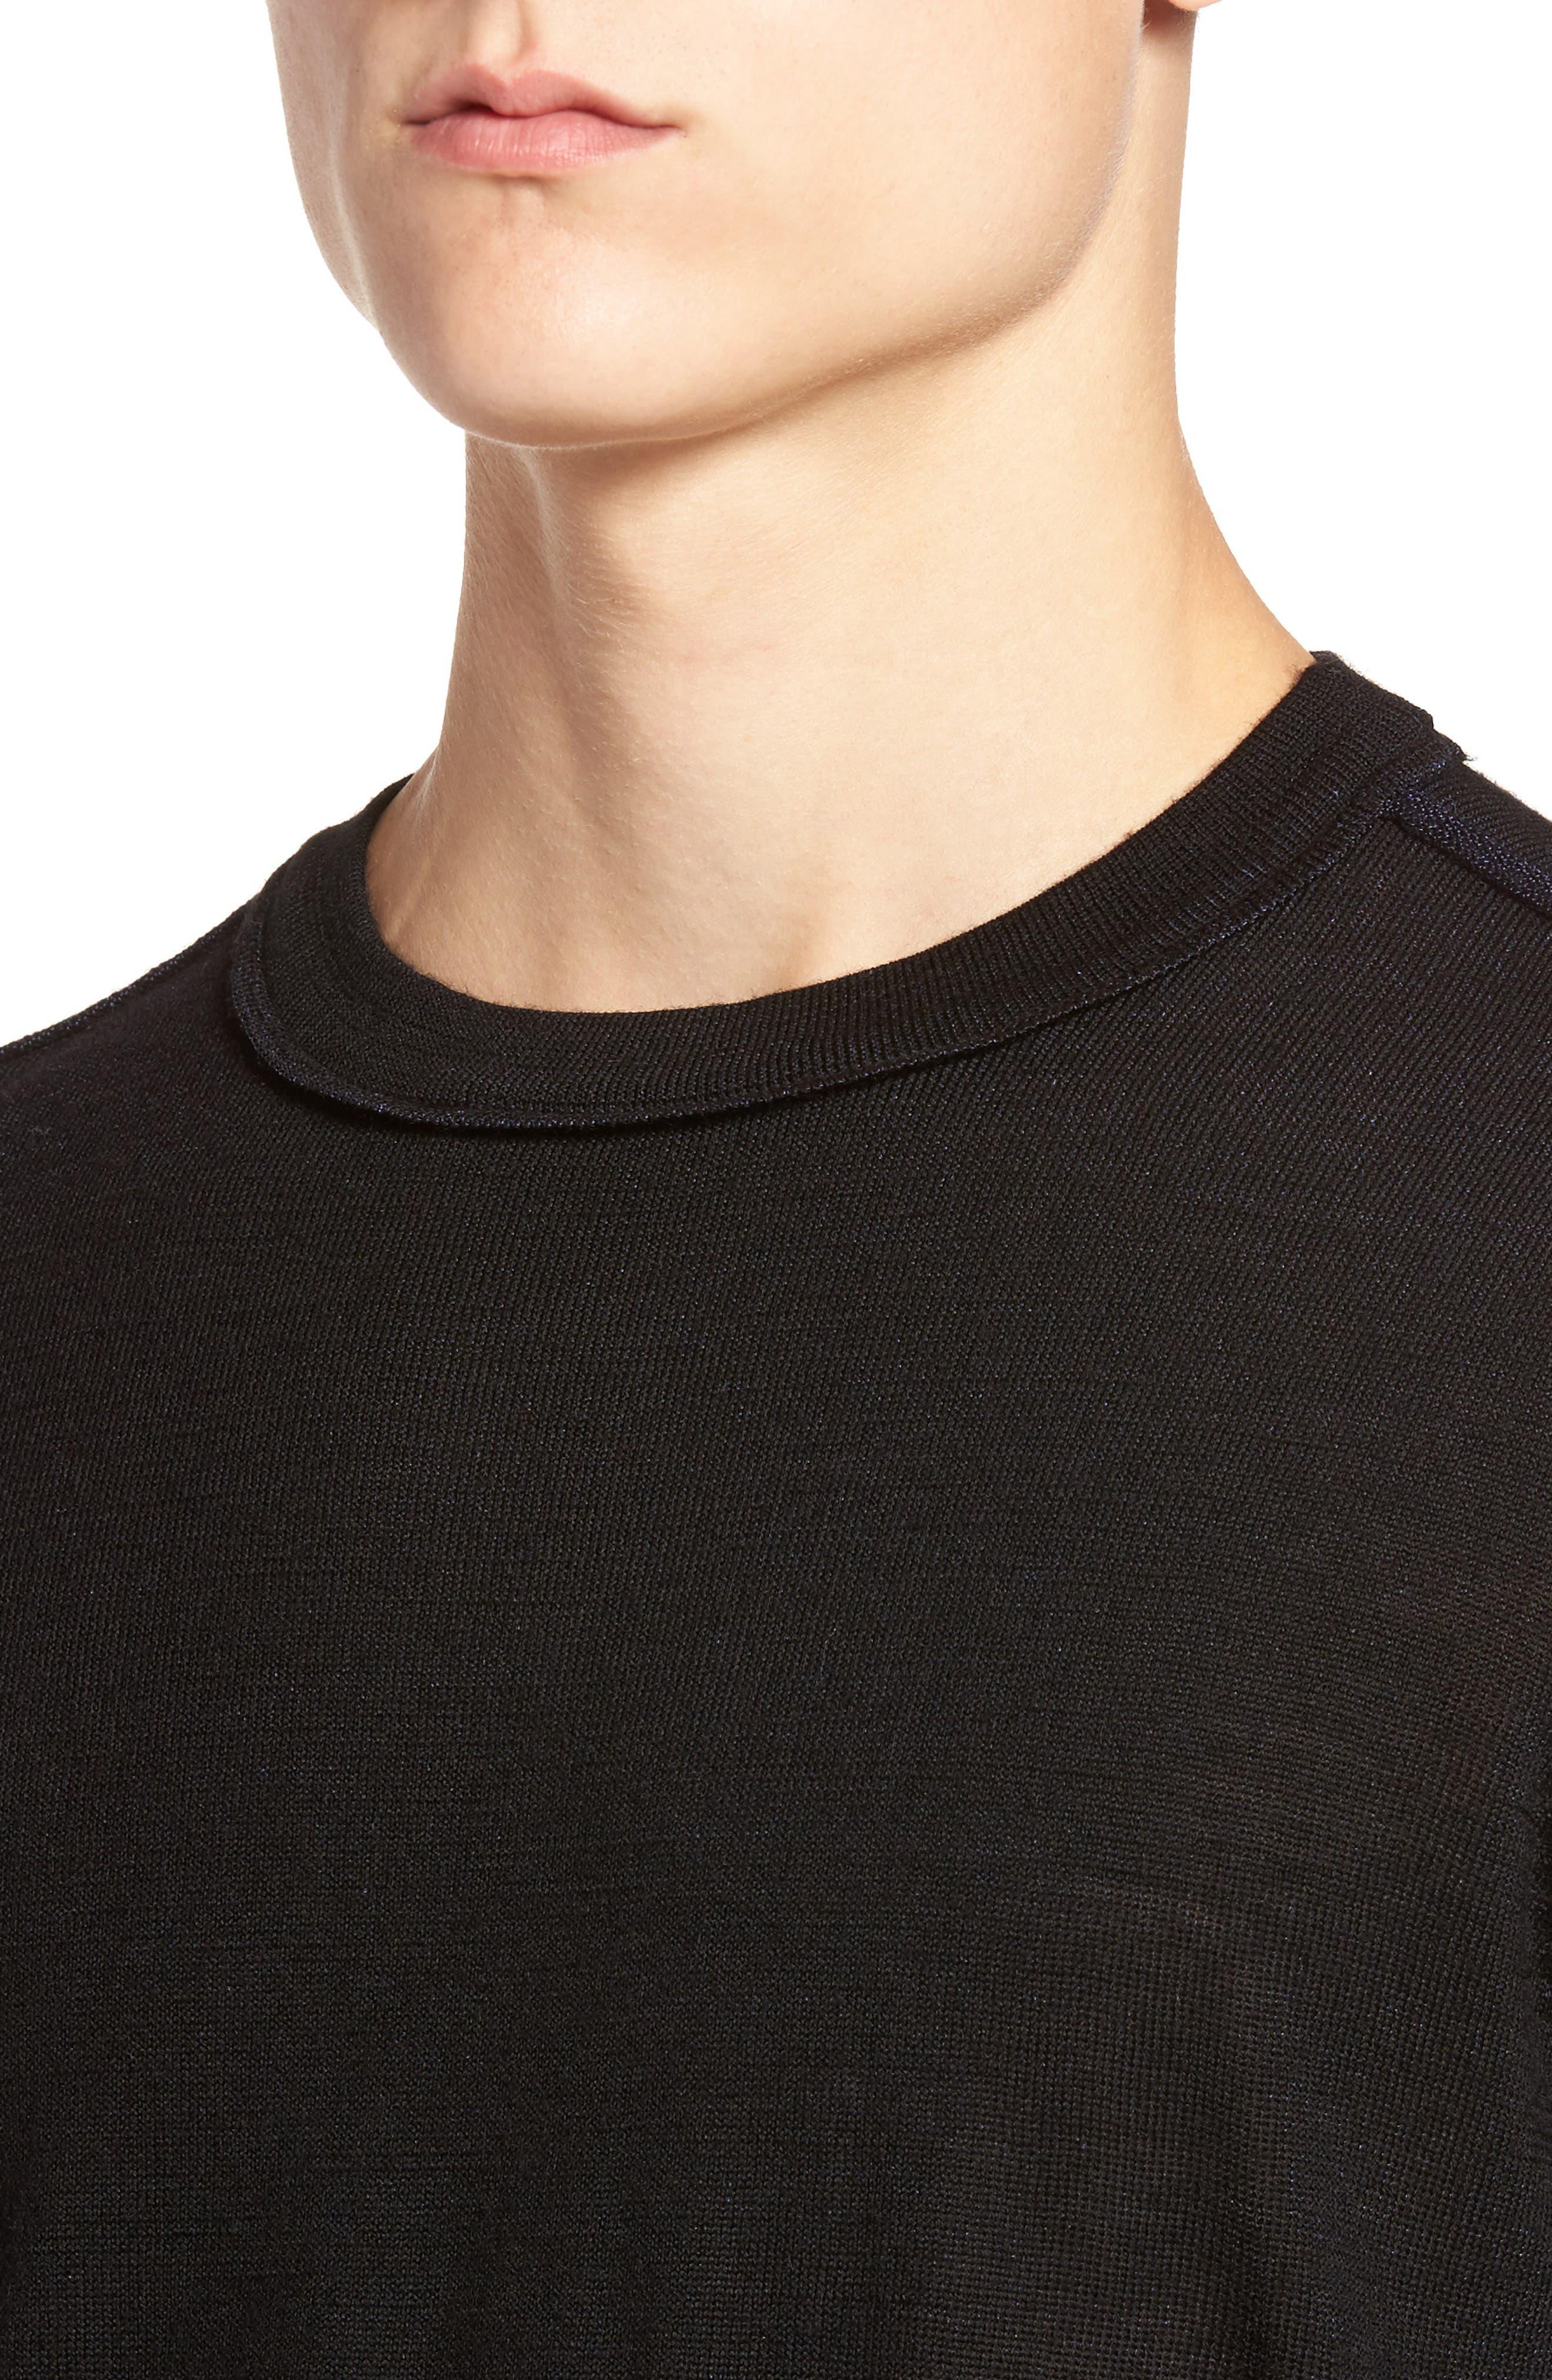 Crewneck Wool Blend Sweater,                             Alternate thumbnail 4, color,                             Black